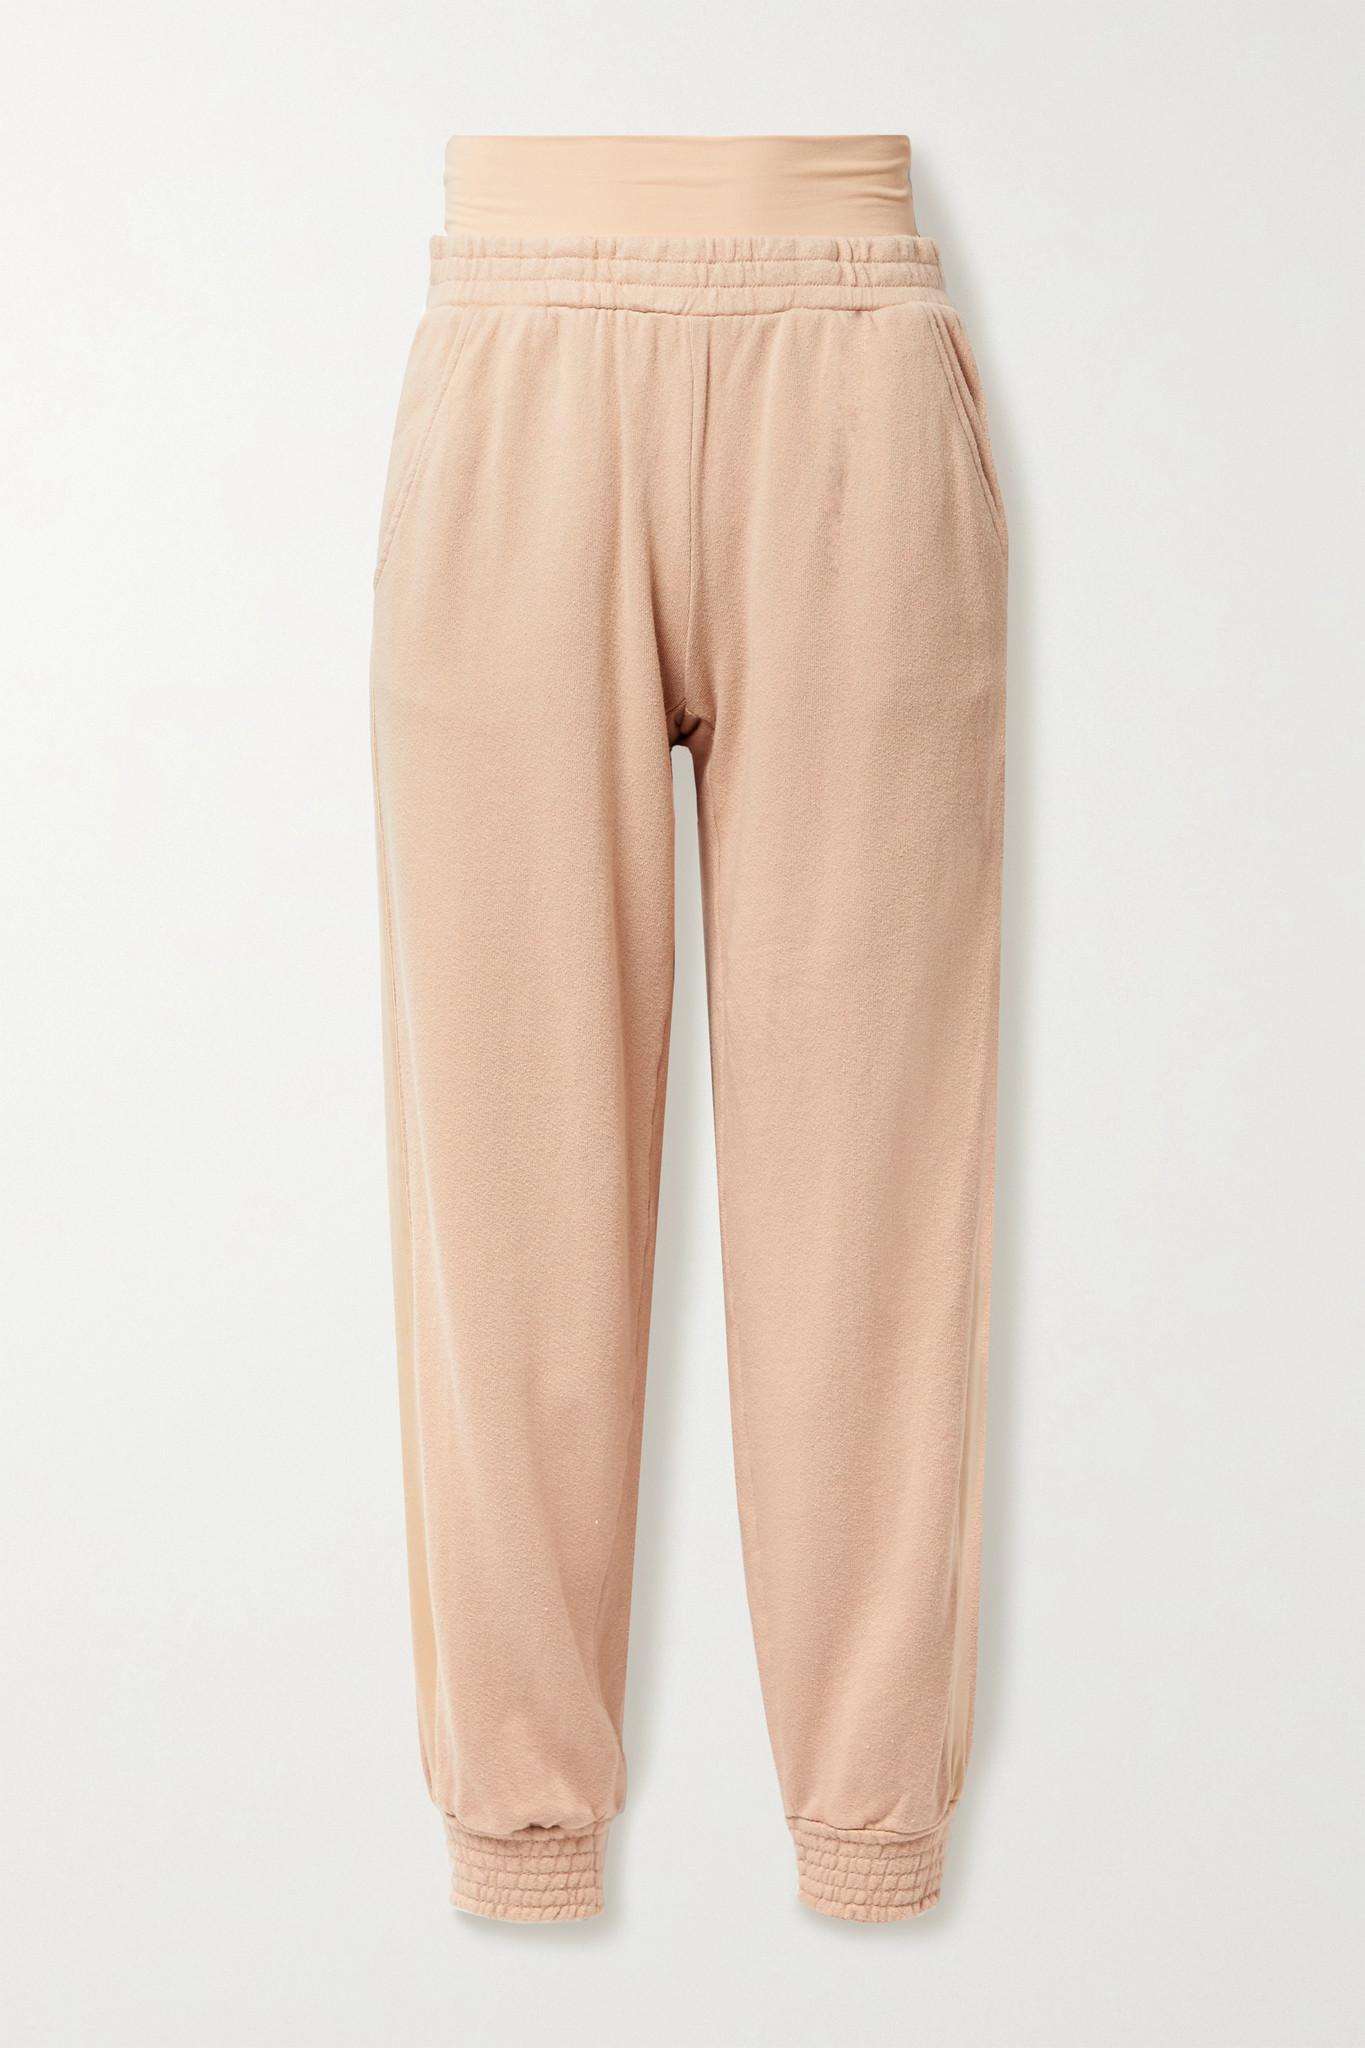 ALICE + OLIVIA - Rio Layered Striped Cotton-jersey Track Pants - Neutrals - x small